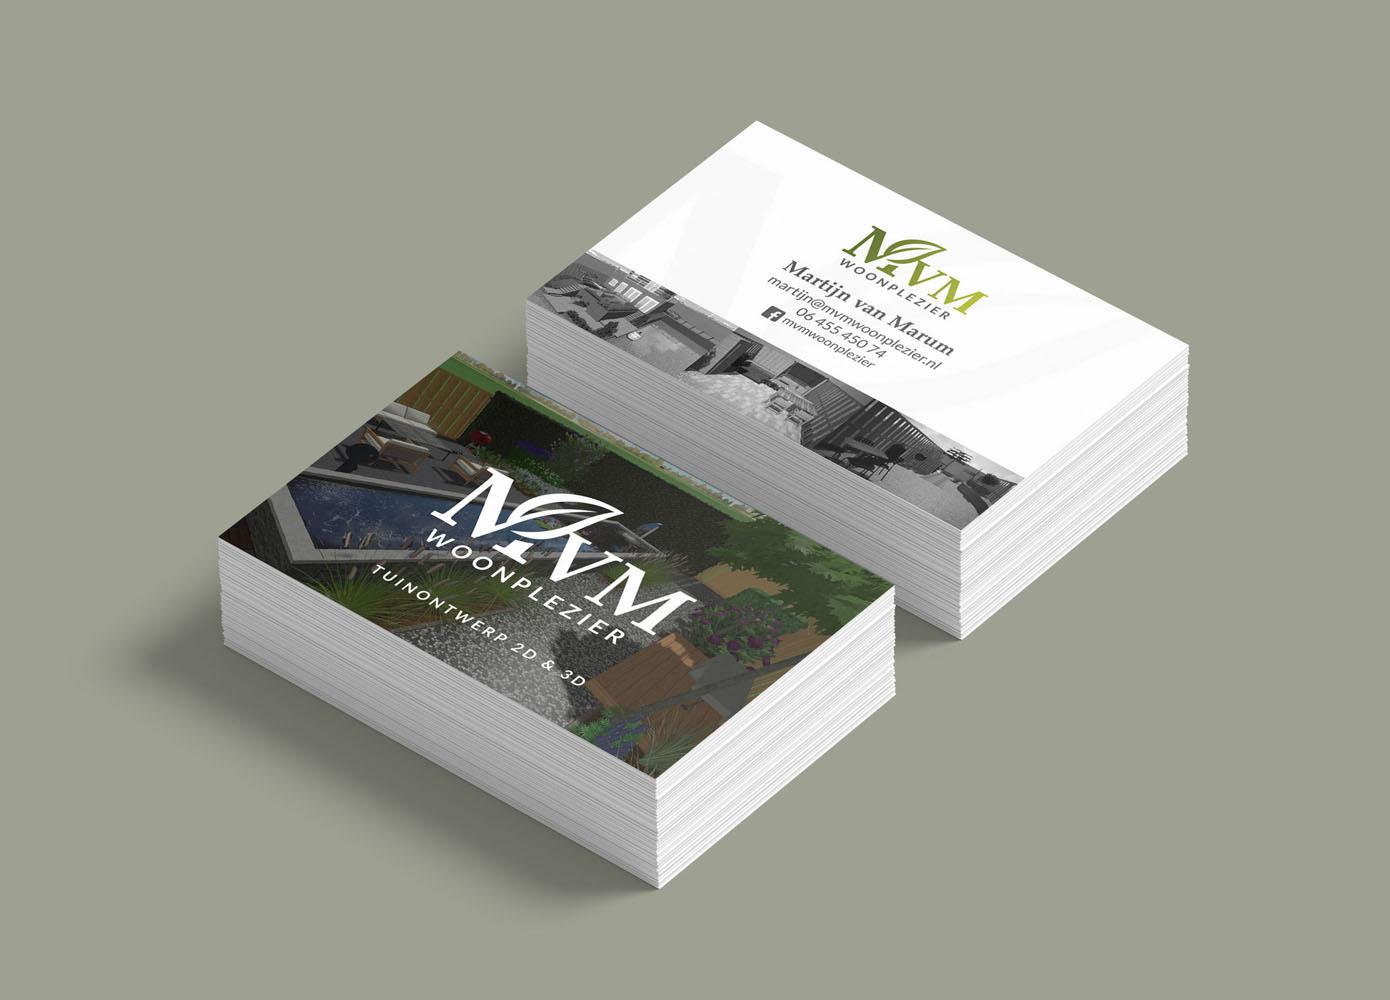 Visitekaart ontwerp MvM Woonplezier